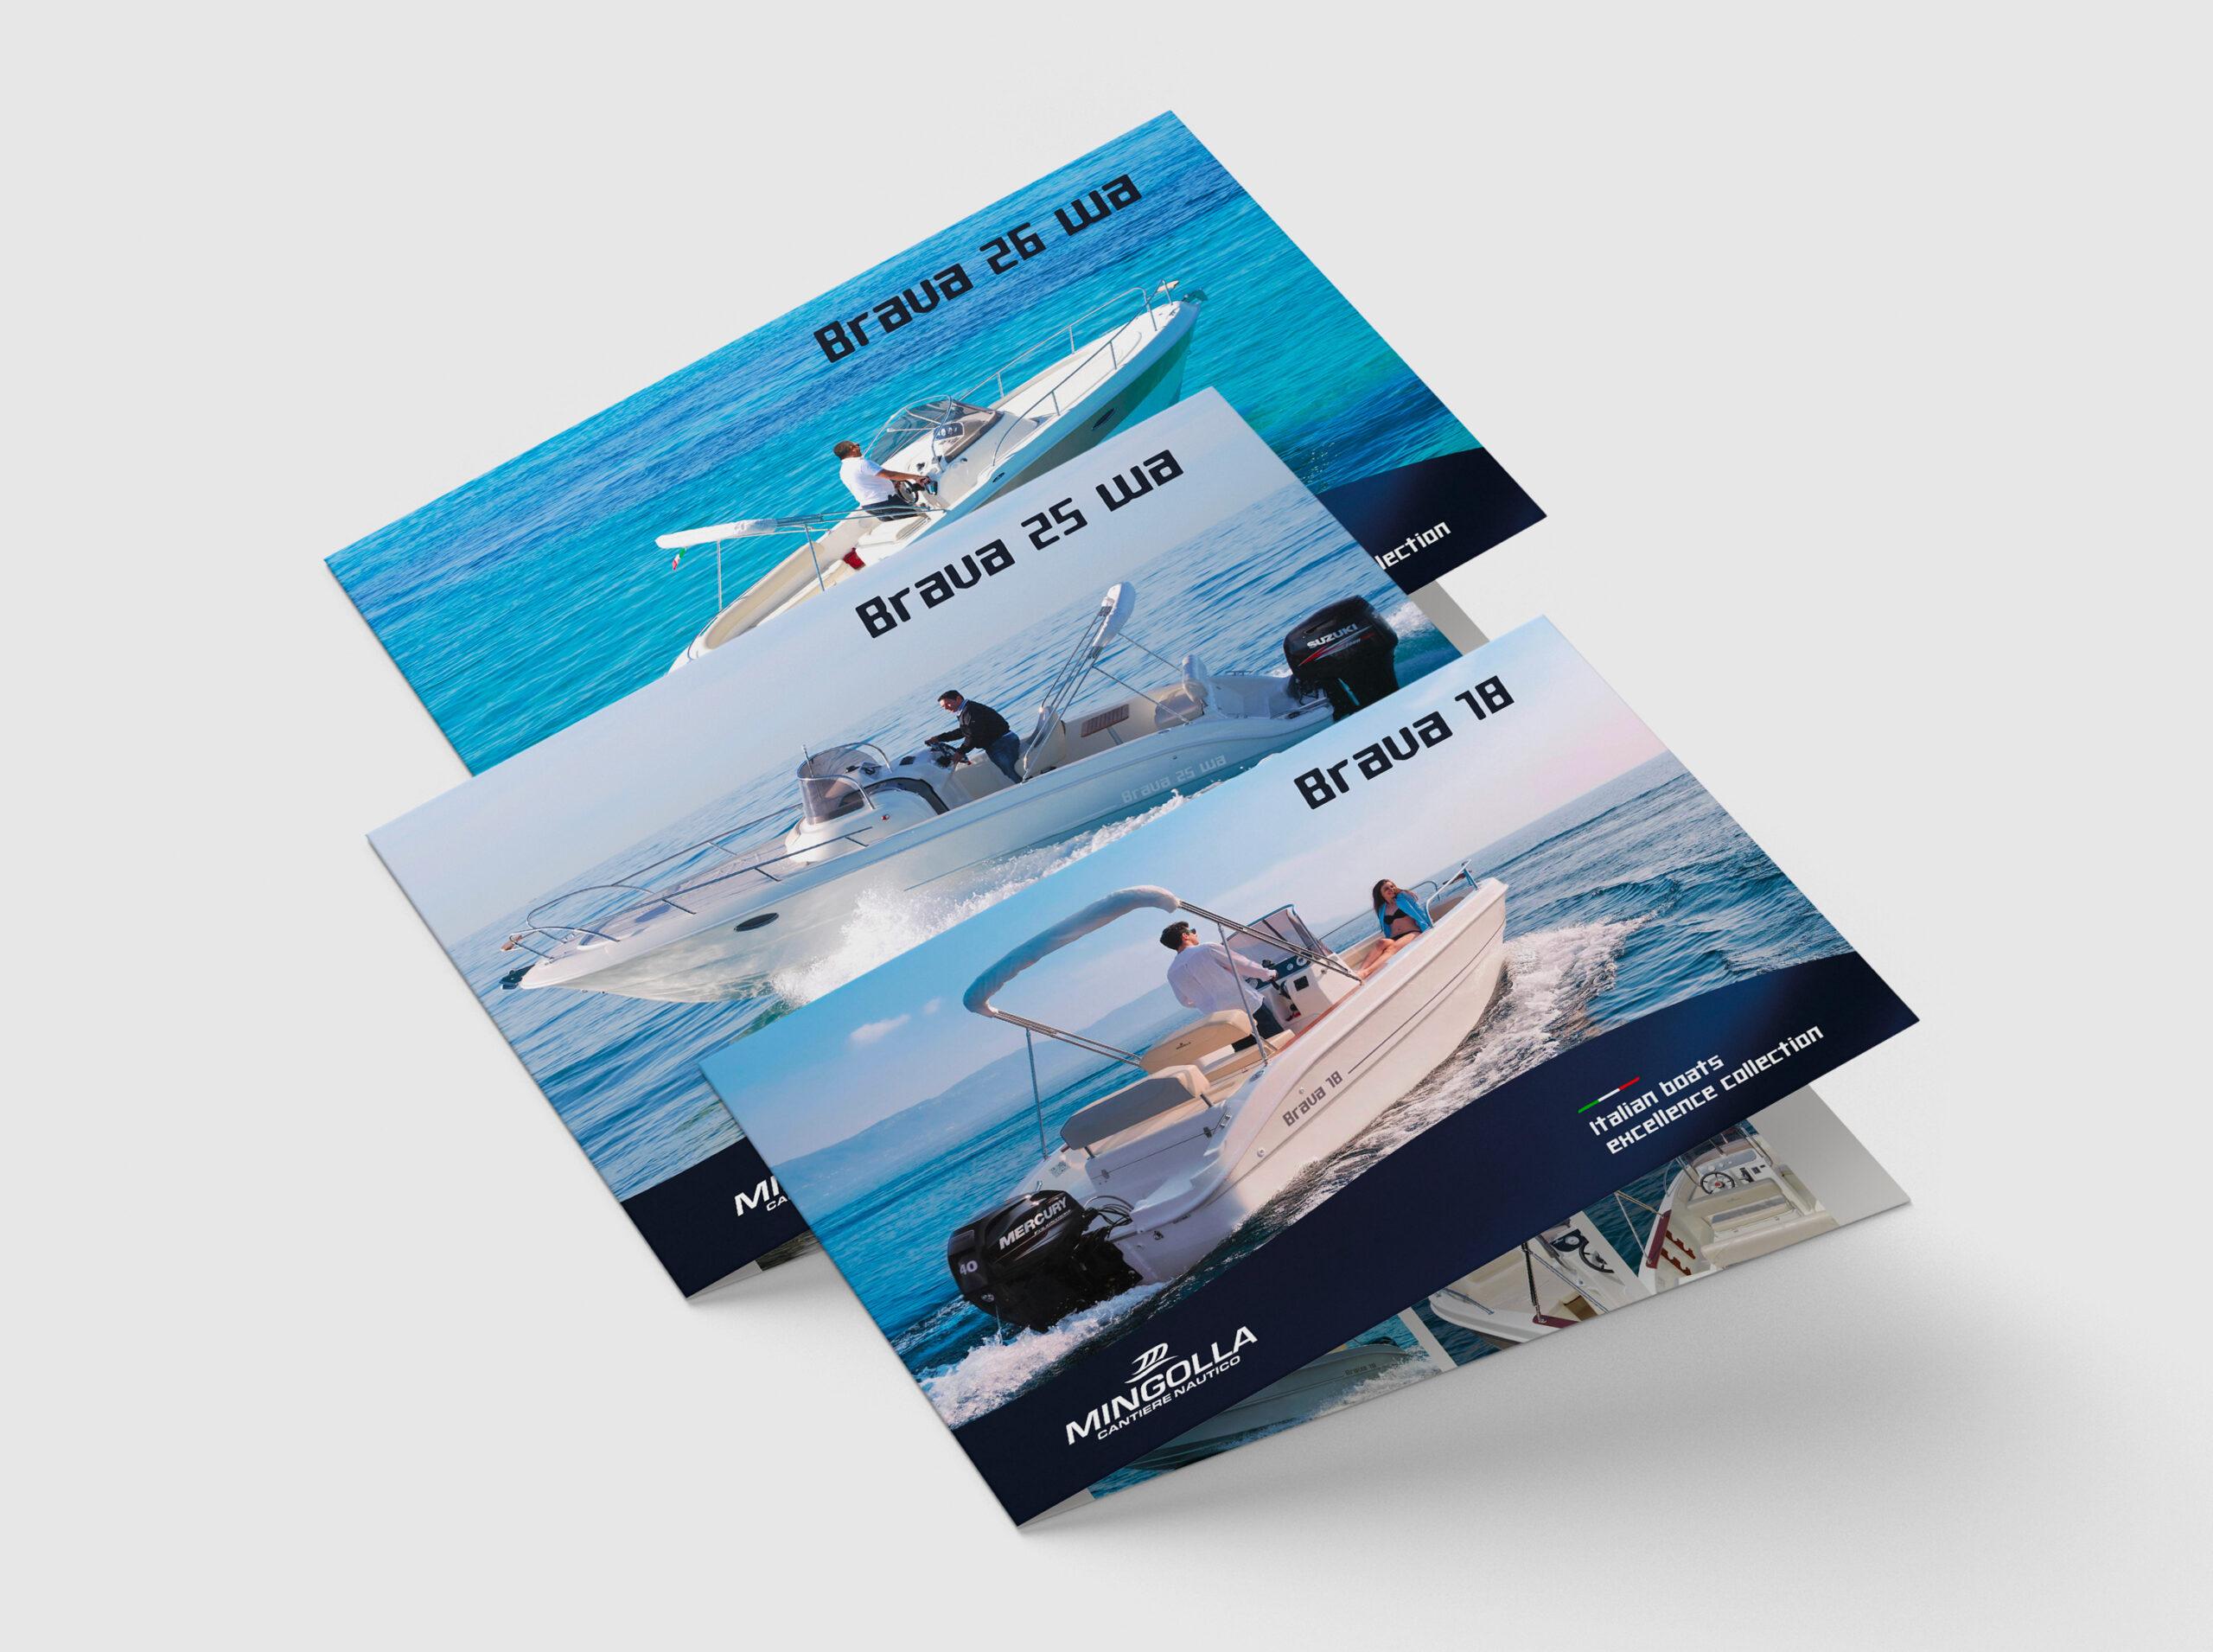 Nautica Mingolla - digital, web, print - img 4